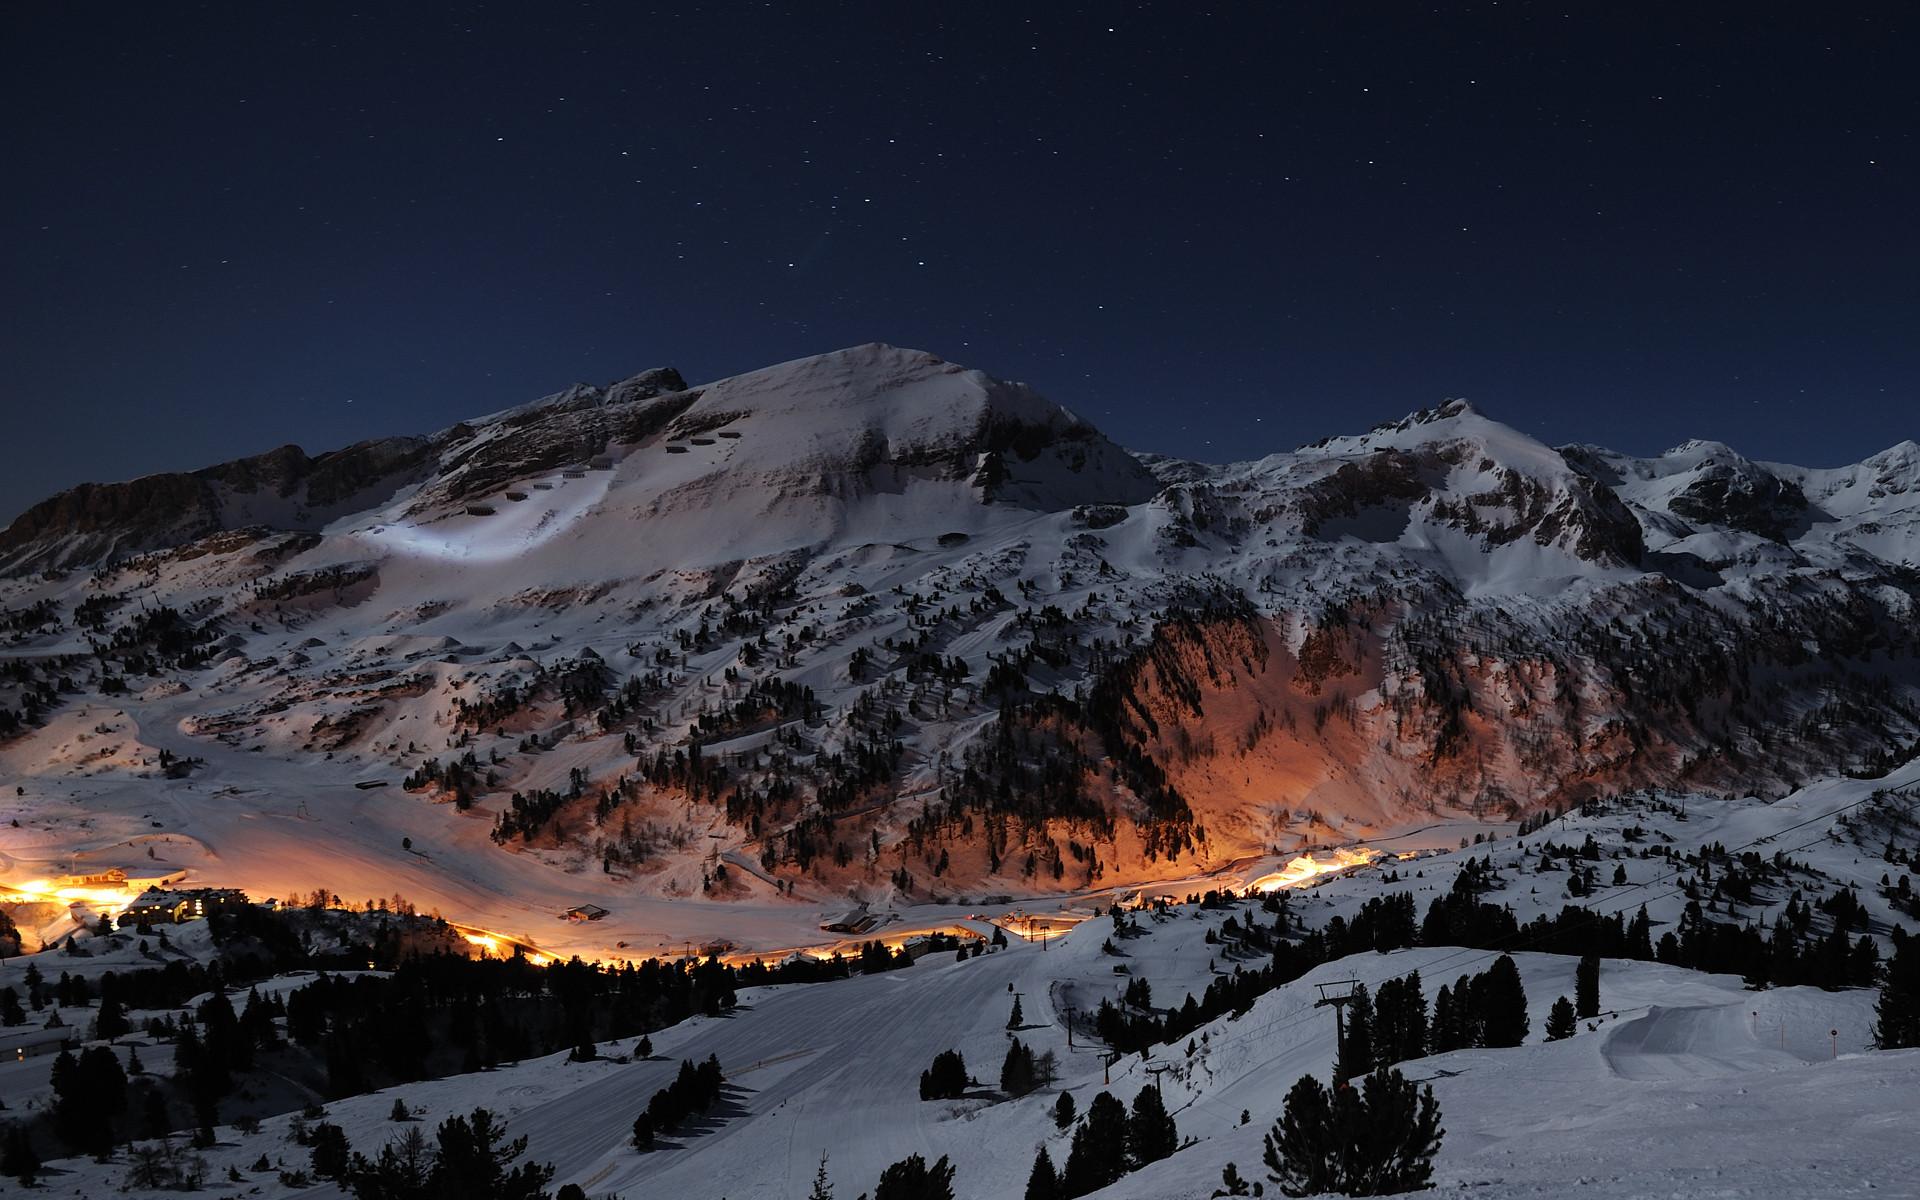 Hd wallpaper mountains - Hd Wallpaper Background Id 238870 2560x1600 Earth Mountain